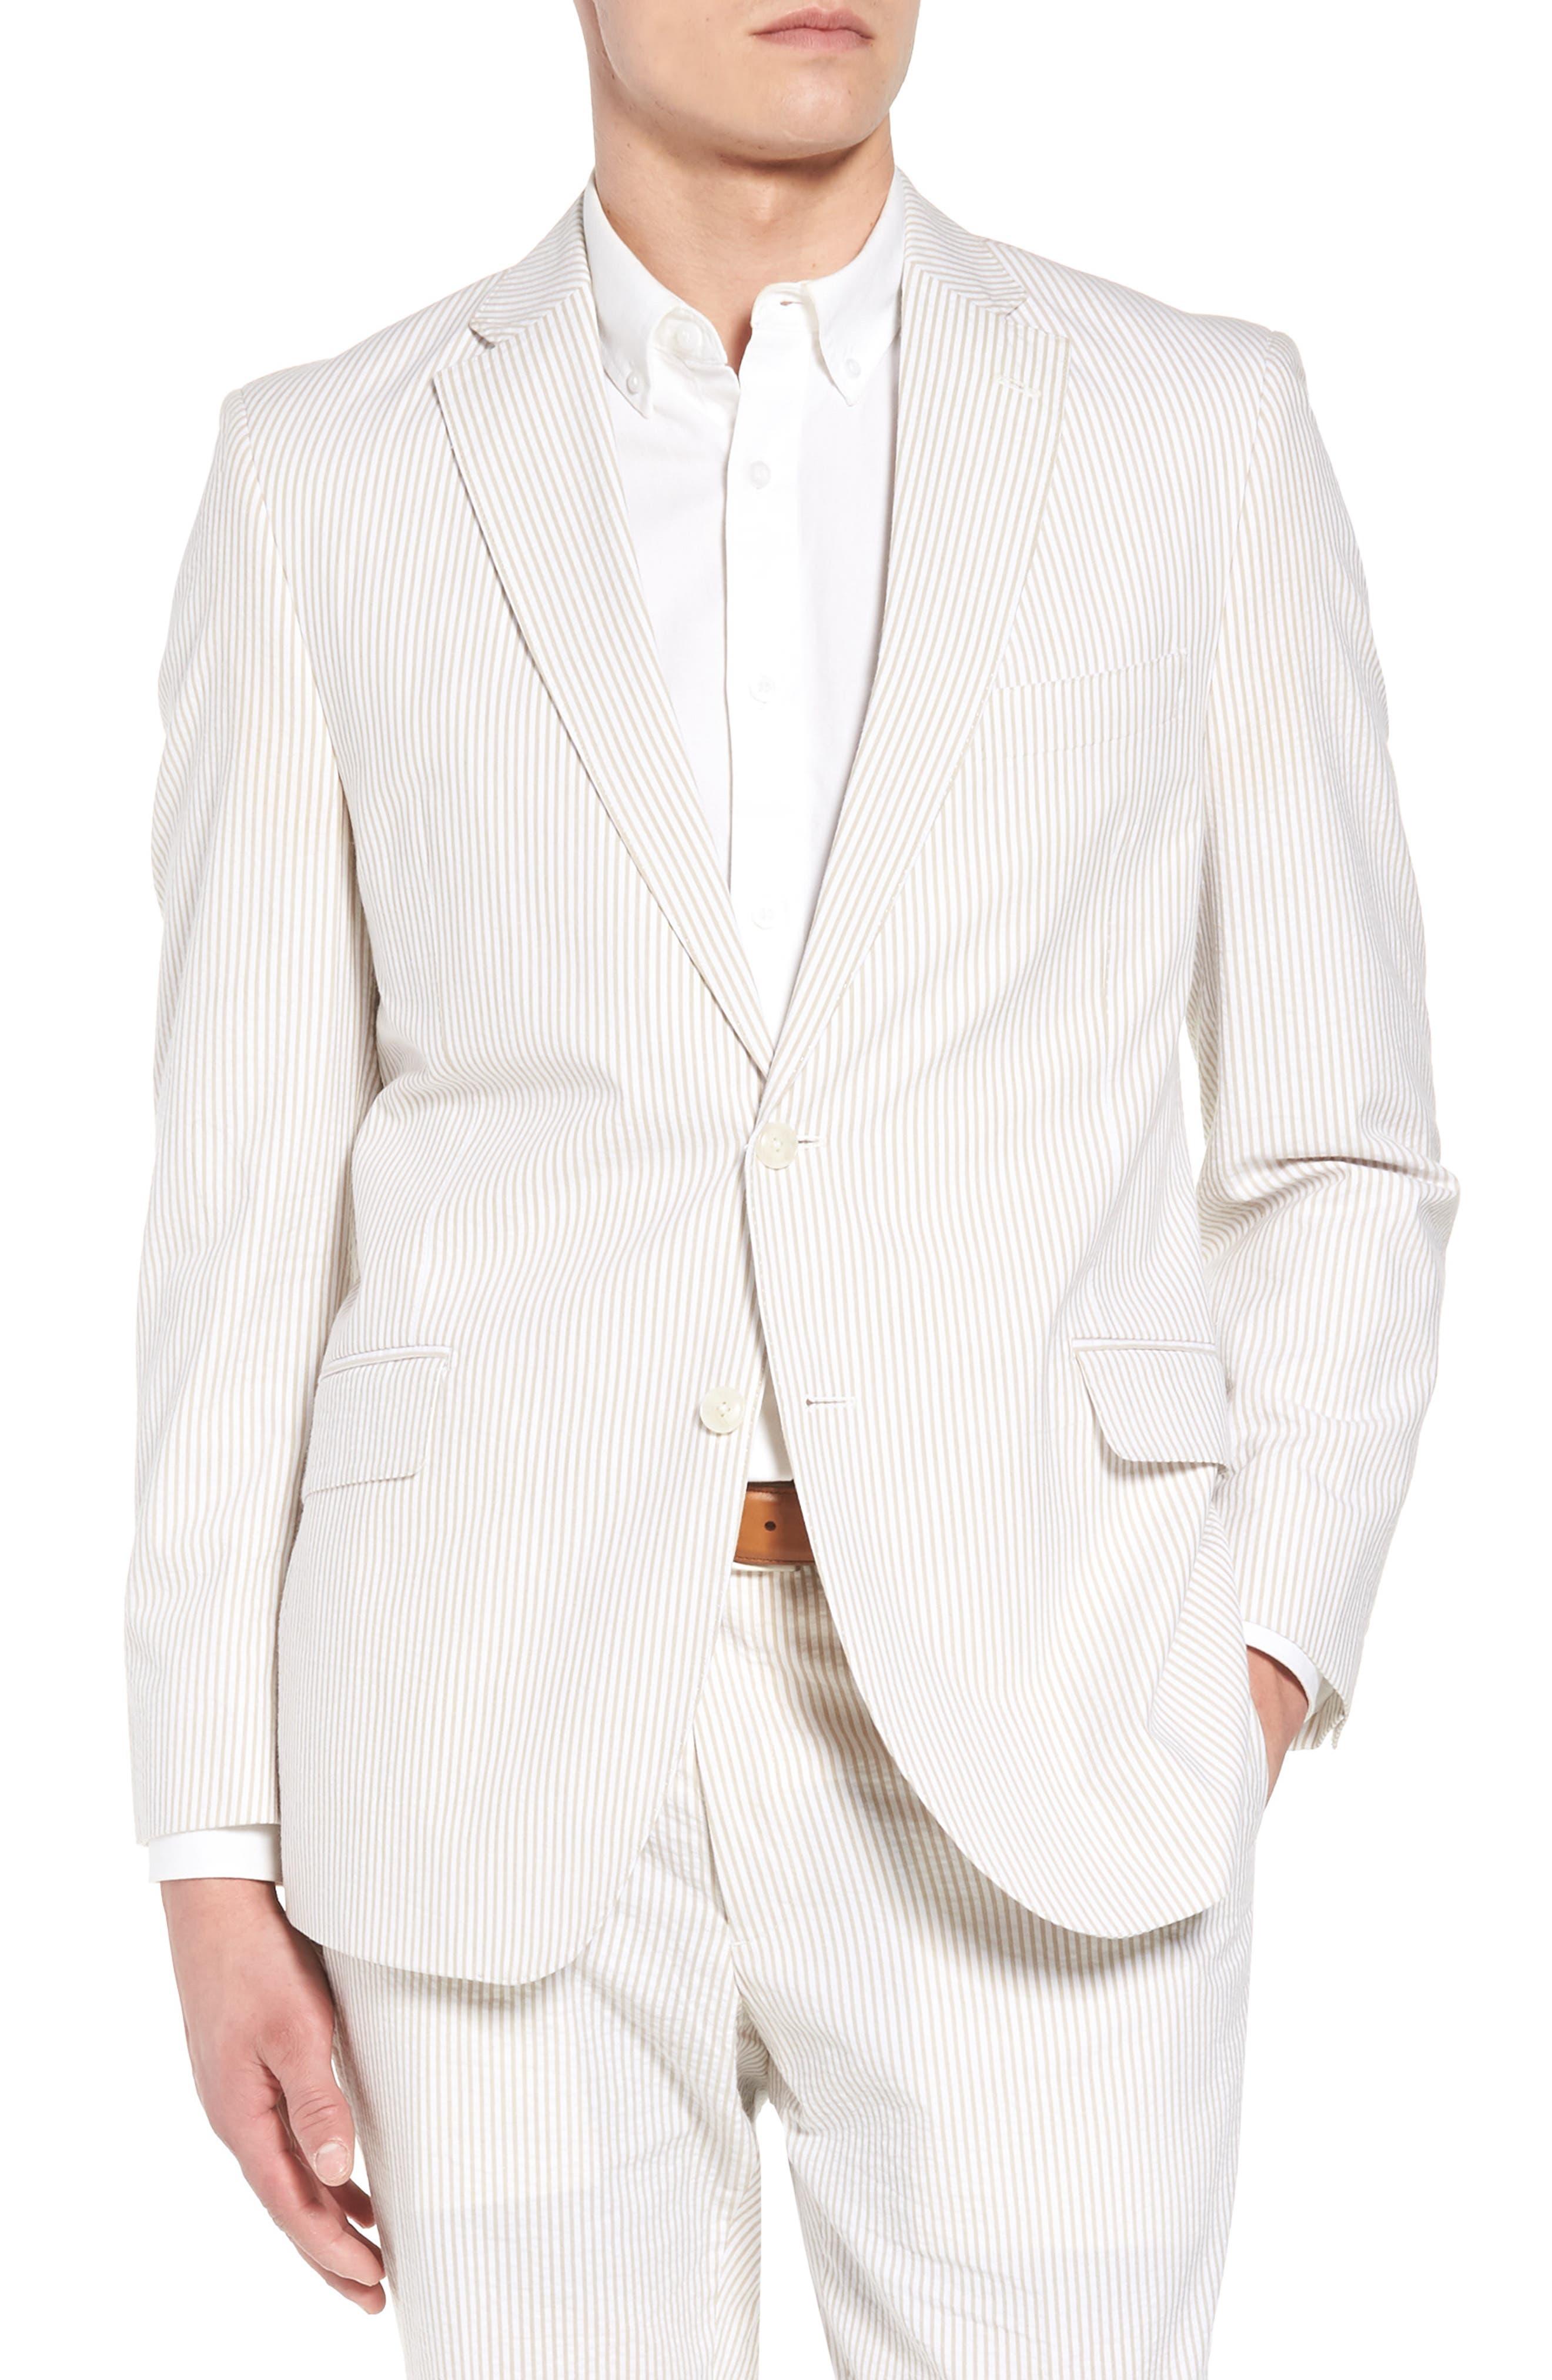 Jack AIM Classic Fit Seersucker Sport Coat,                             Main thumbnail 1, color,                             TAN AND WHITE